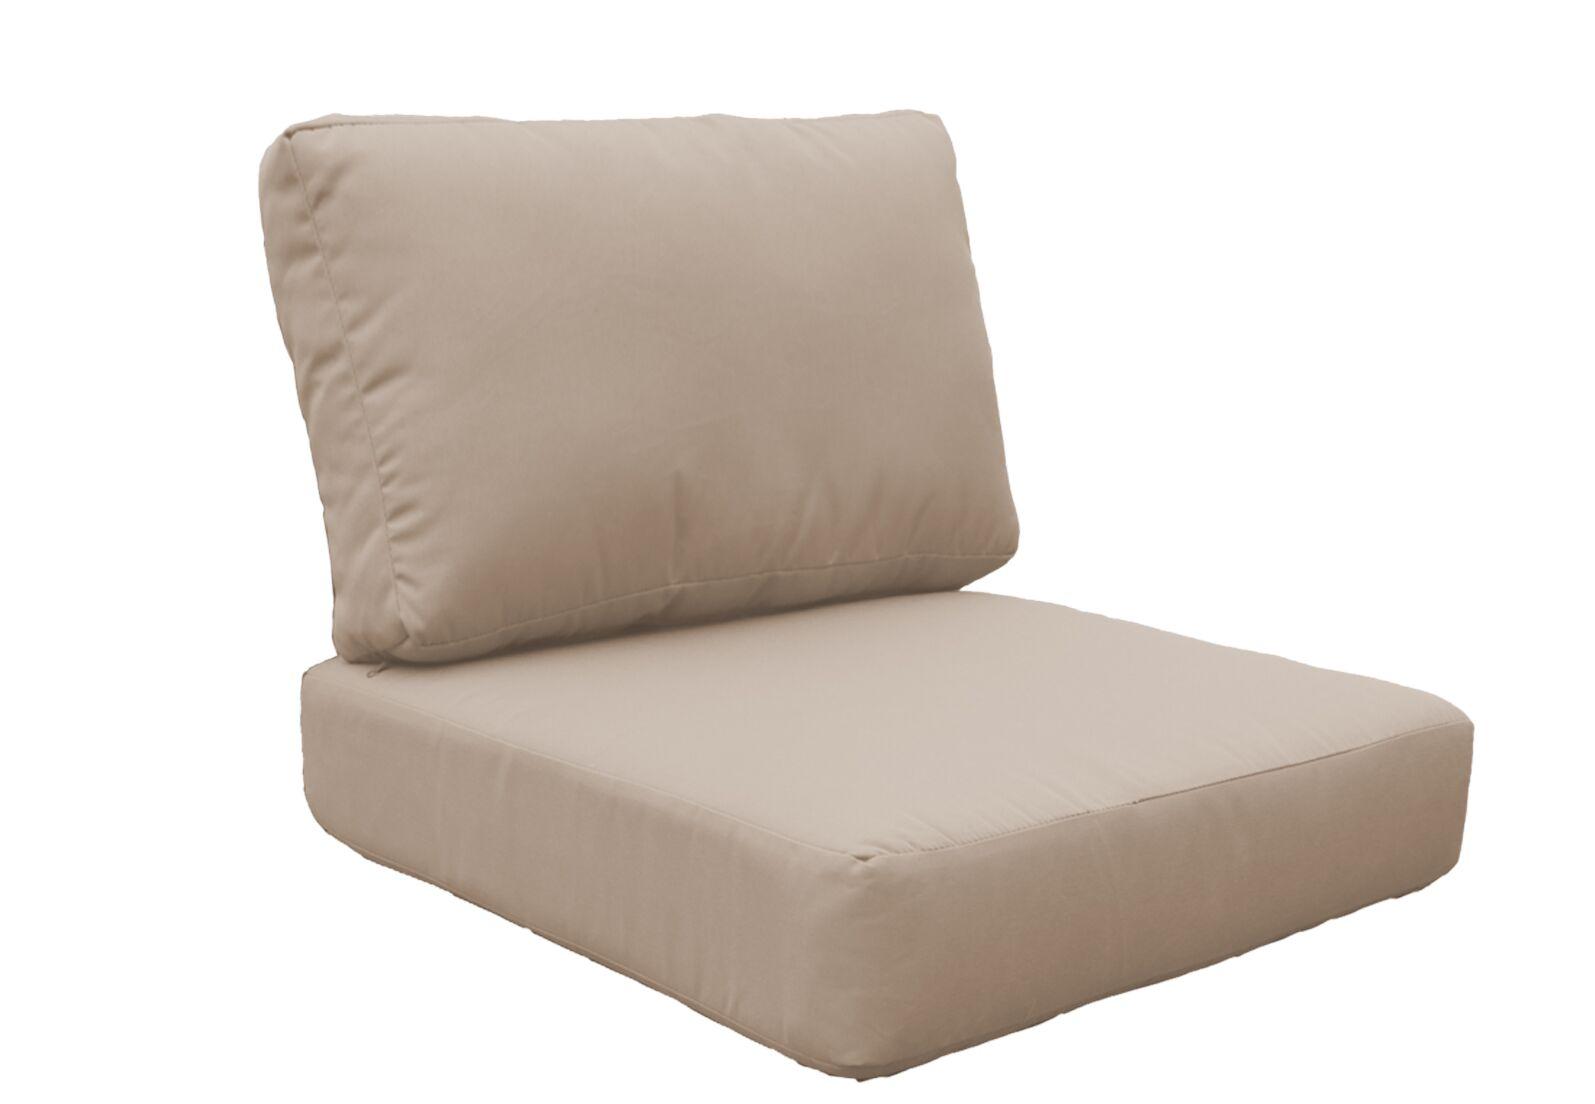 Miami Outdoor Lounge Chair Cushion Fabric: Wheat